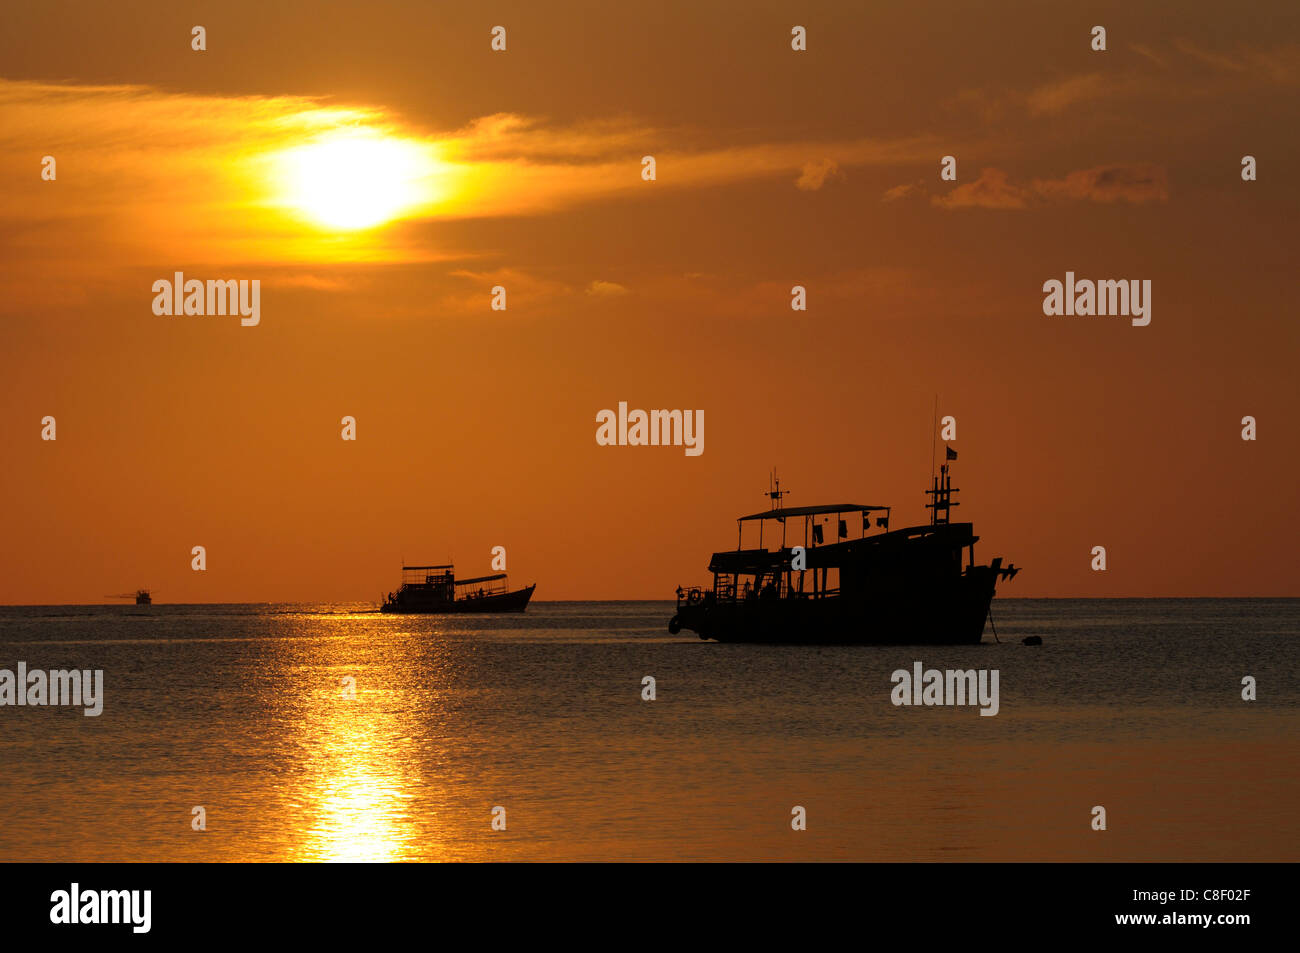 Boats, sunset, Sai Ree, Beach, Koh Tao, Thailand, Asia, Stock Photo